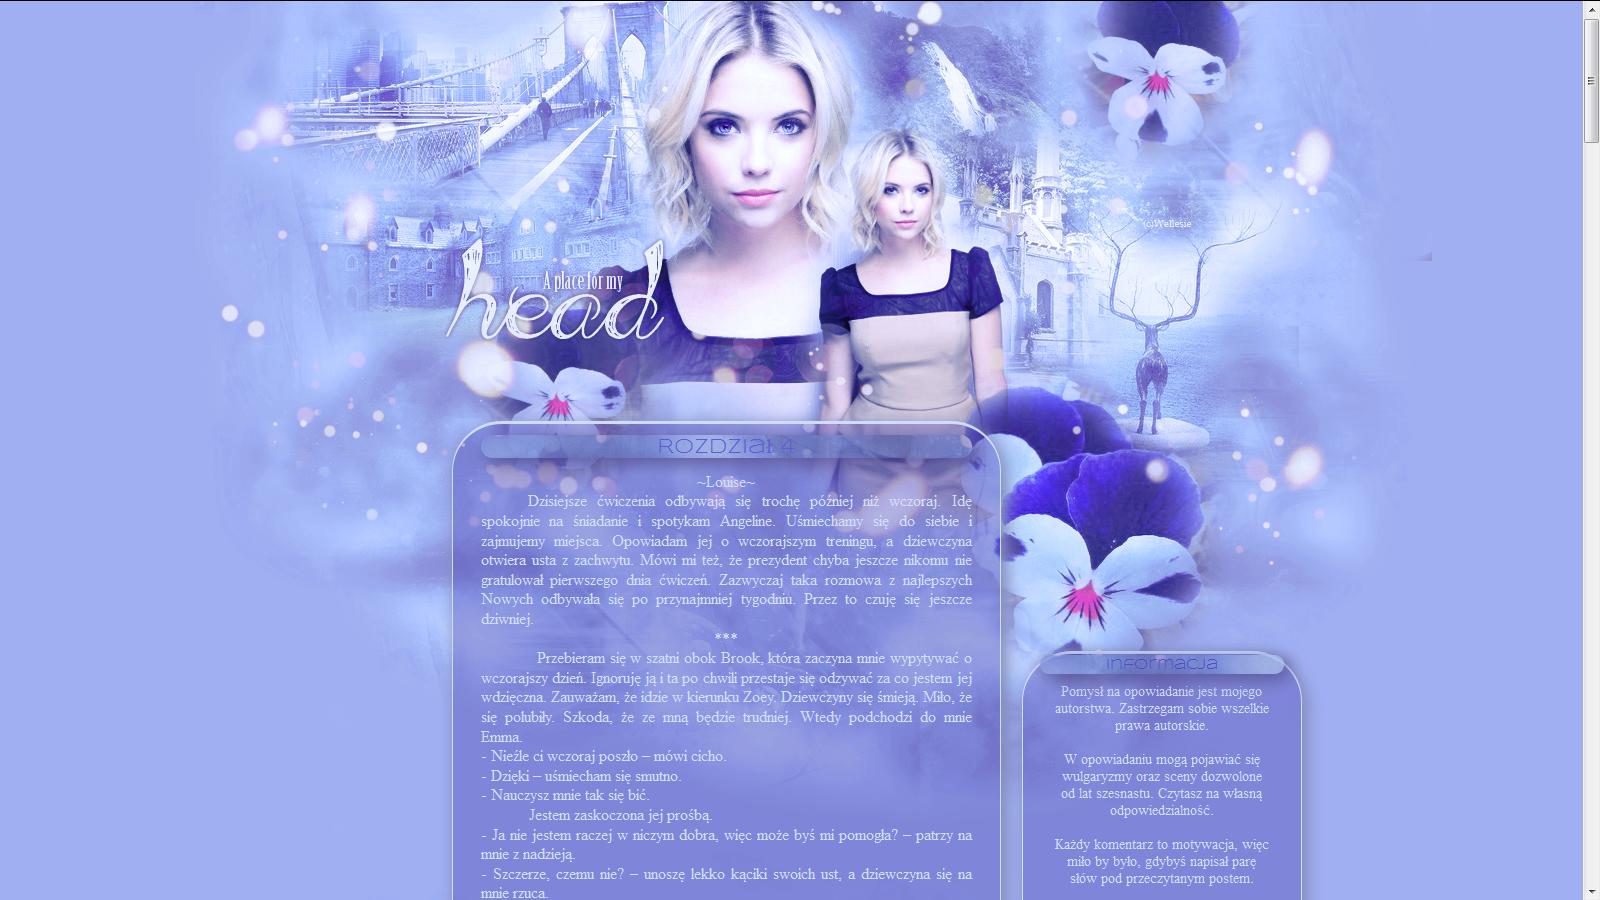 http://mlodziiwaleczni.blogspot.com